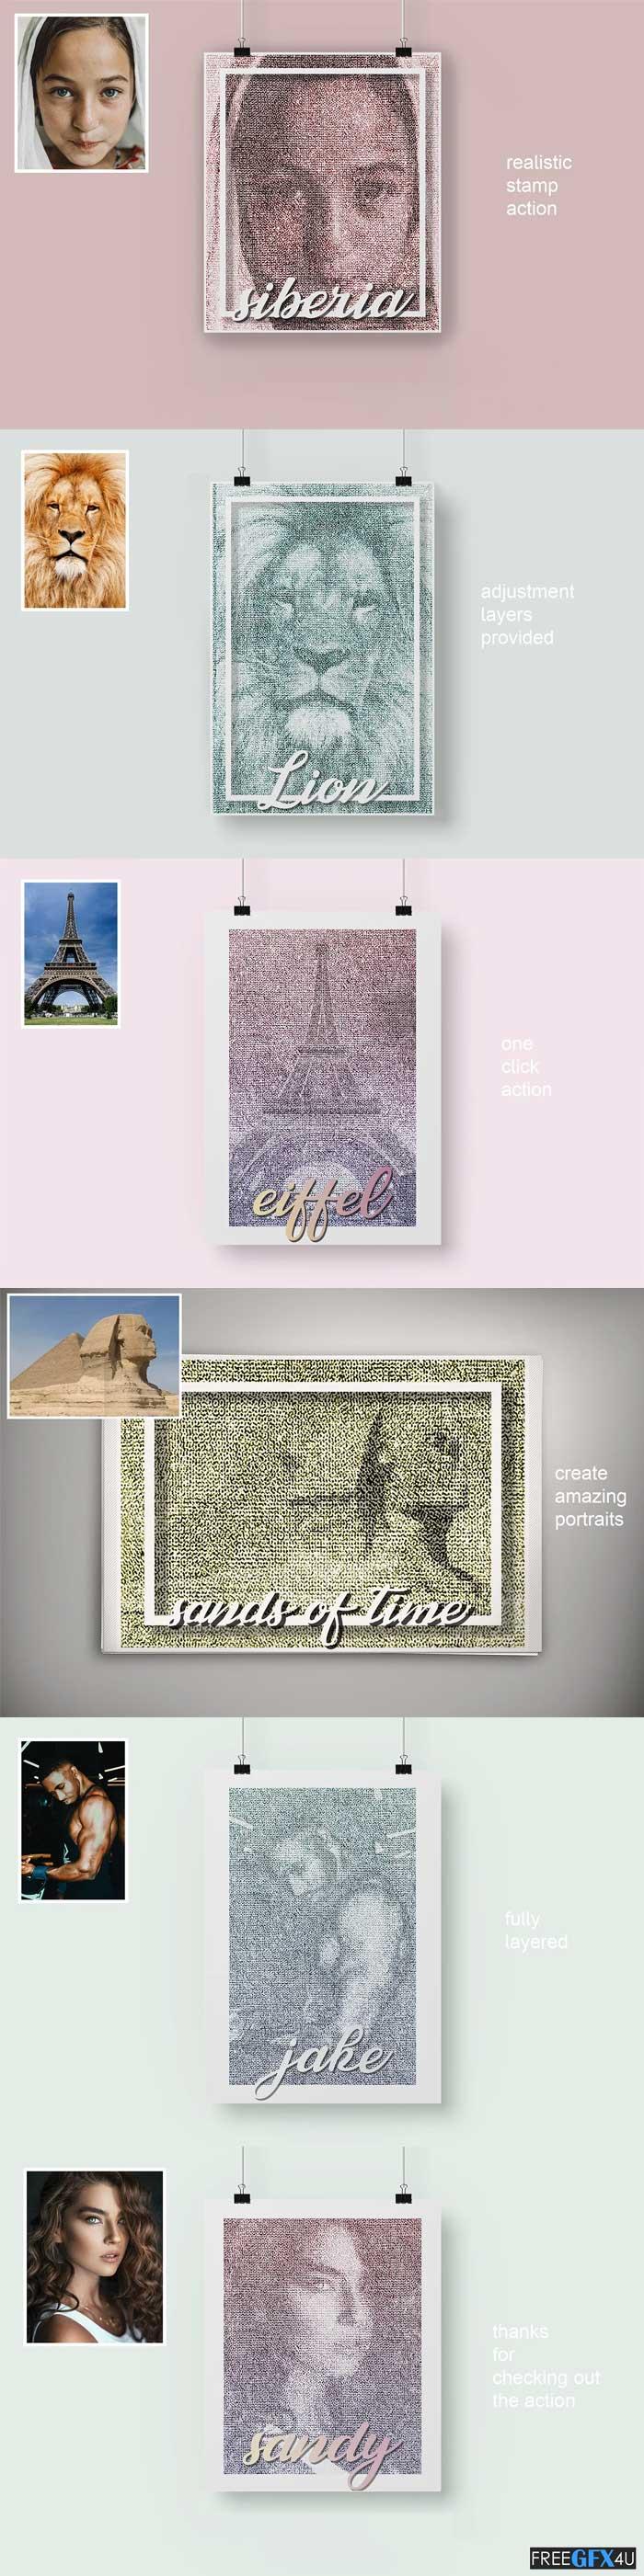 Stamp portrait Photoshop Action